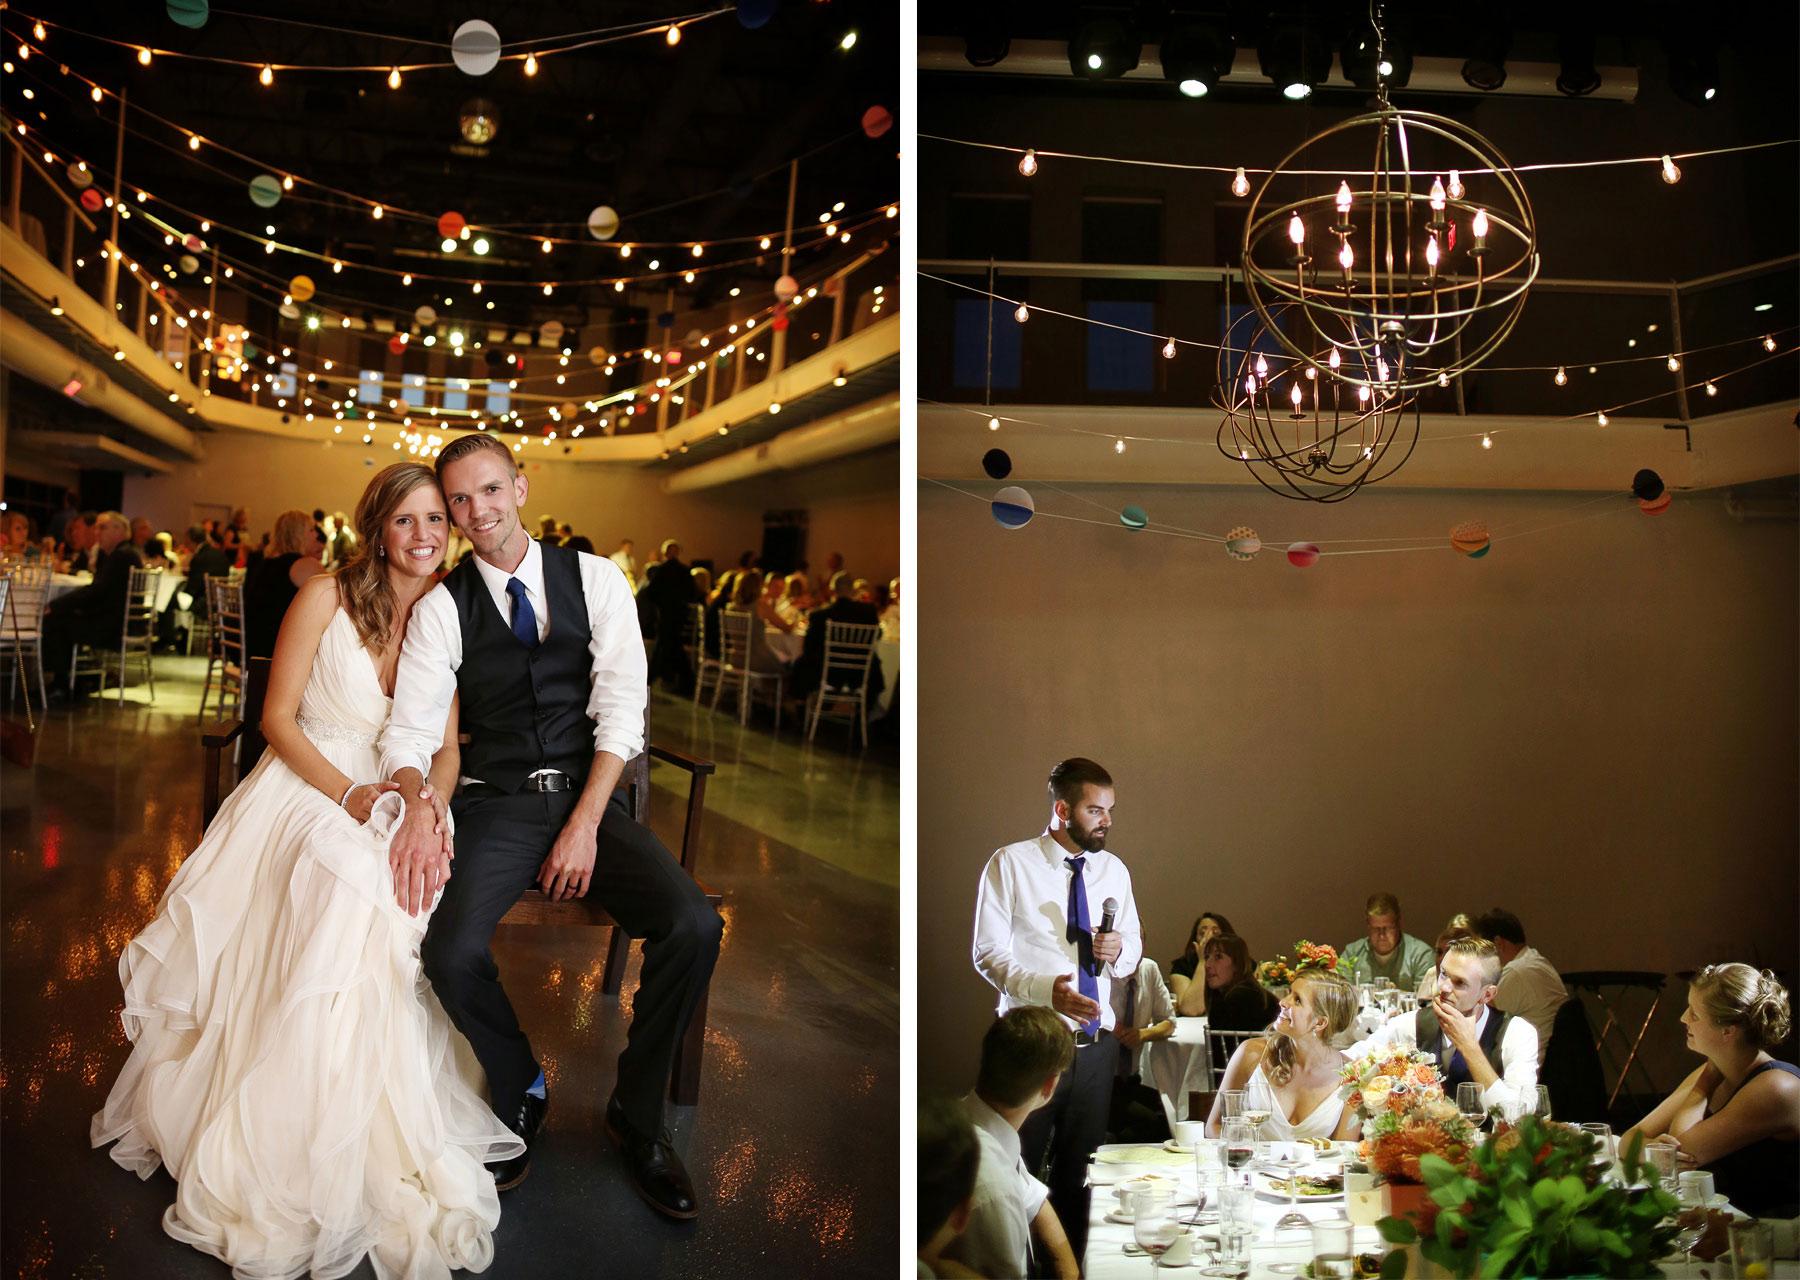 17-Minneapolis-Minnesota-Wedding-Photography-by-Vick-Photography-Muse-Event-Center-Reception-Decor-Jess-&-Jake.jpg